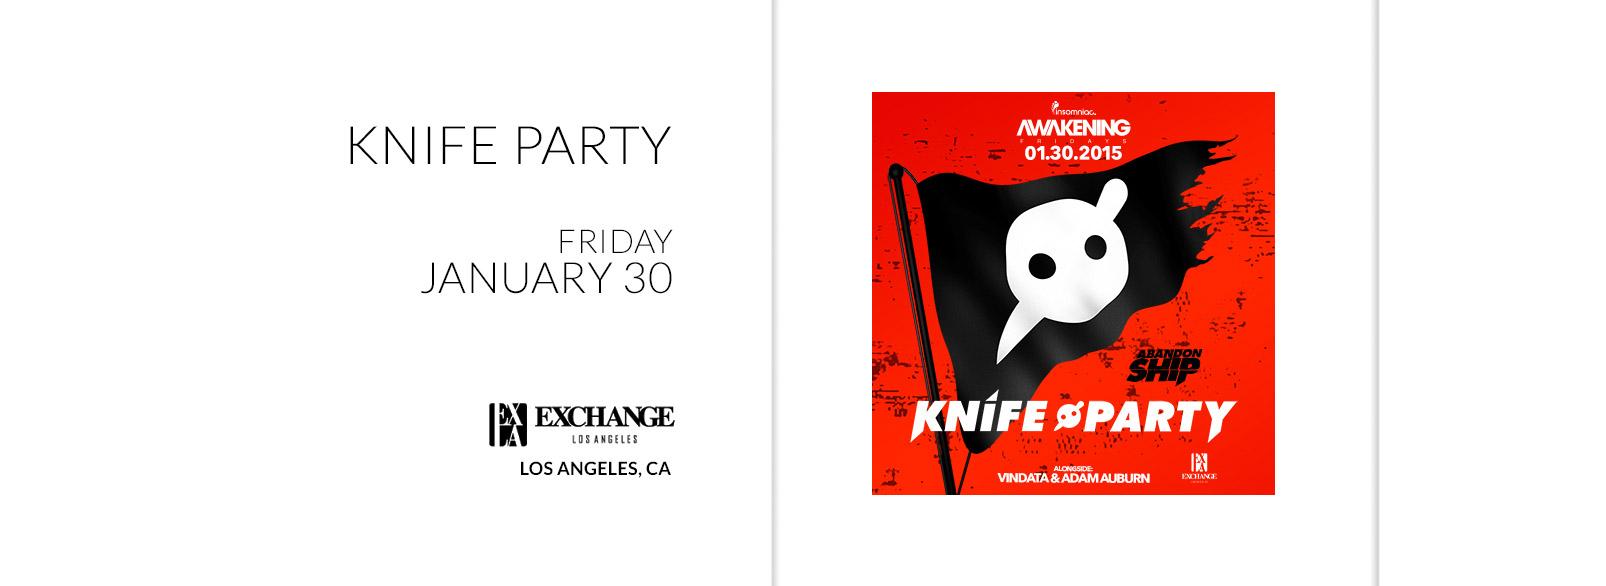 Knife Party @ Exchange LA